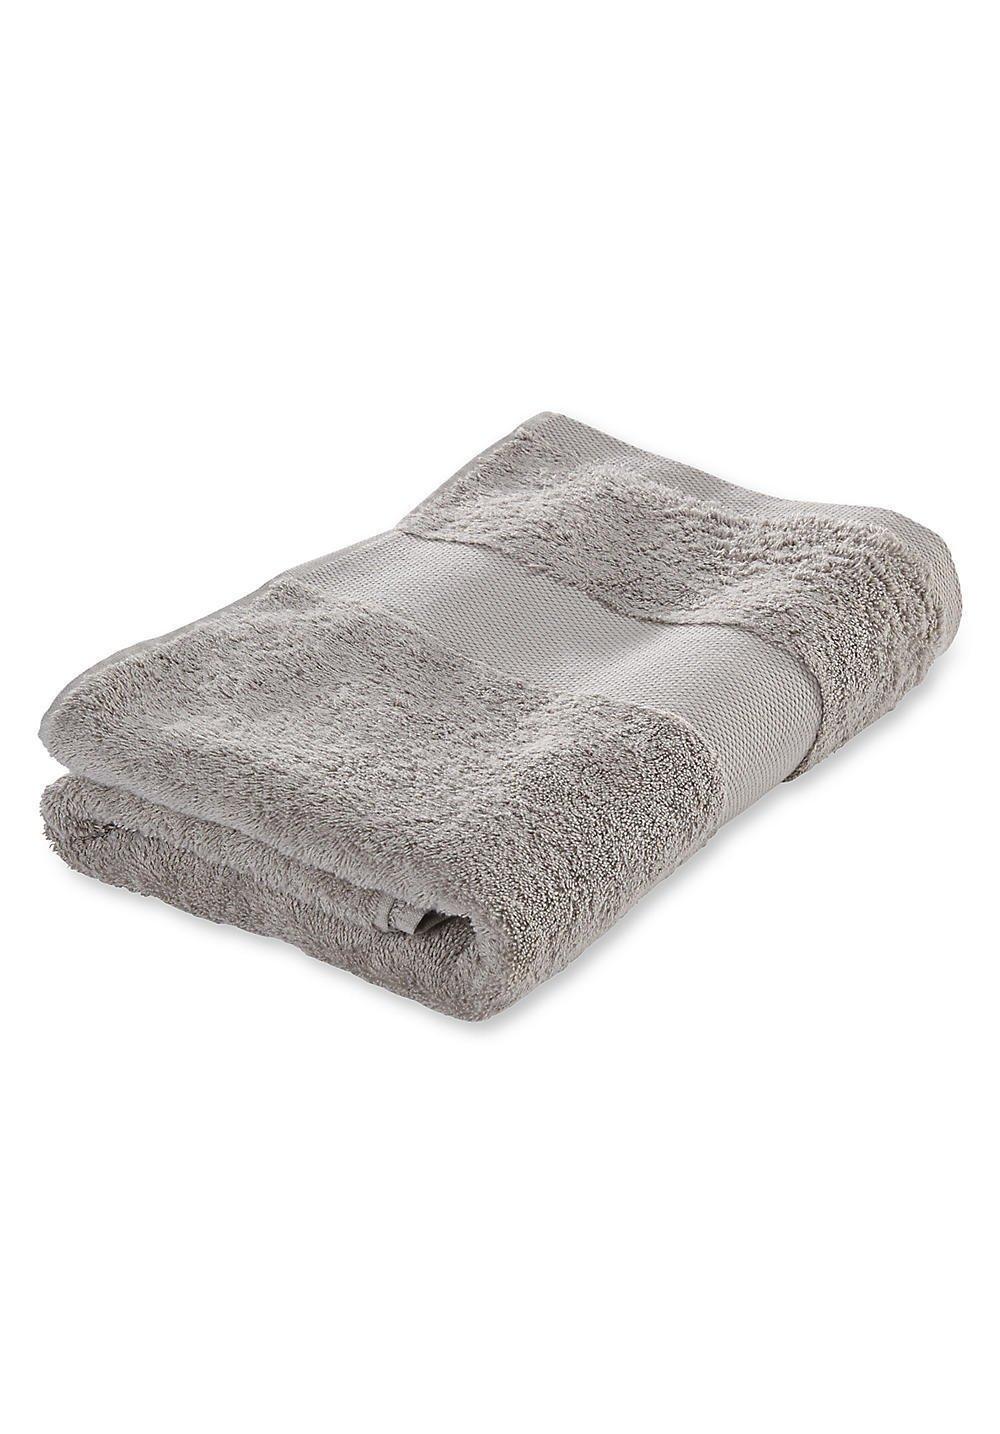 hessnatur de rizo - Toalla de ducha (algodón biológico puro, kashmir, 67x140 cm: Amazon.es: Hogar